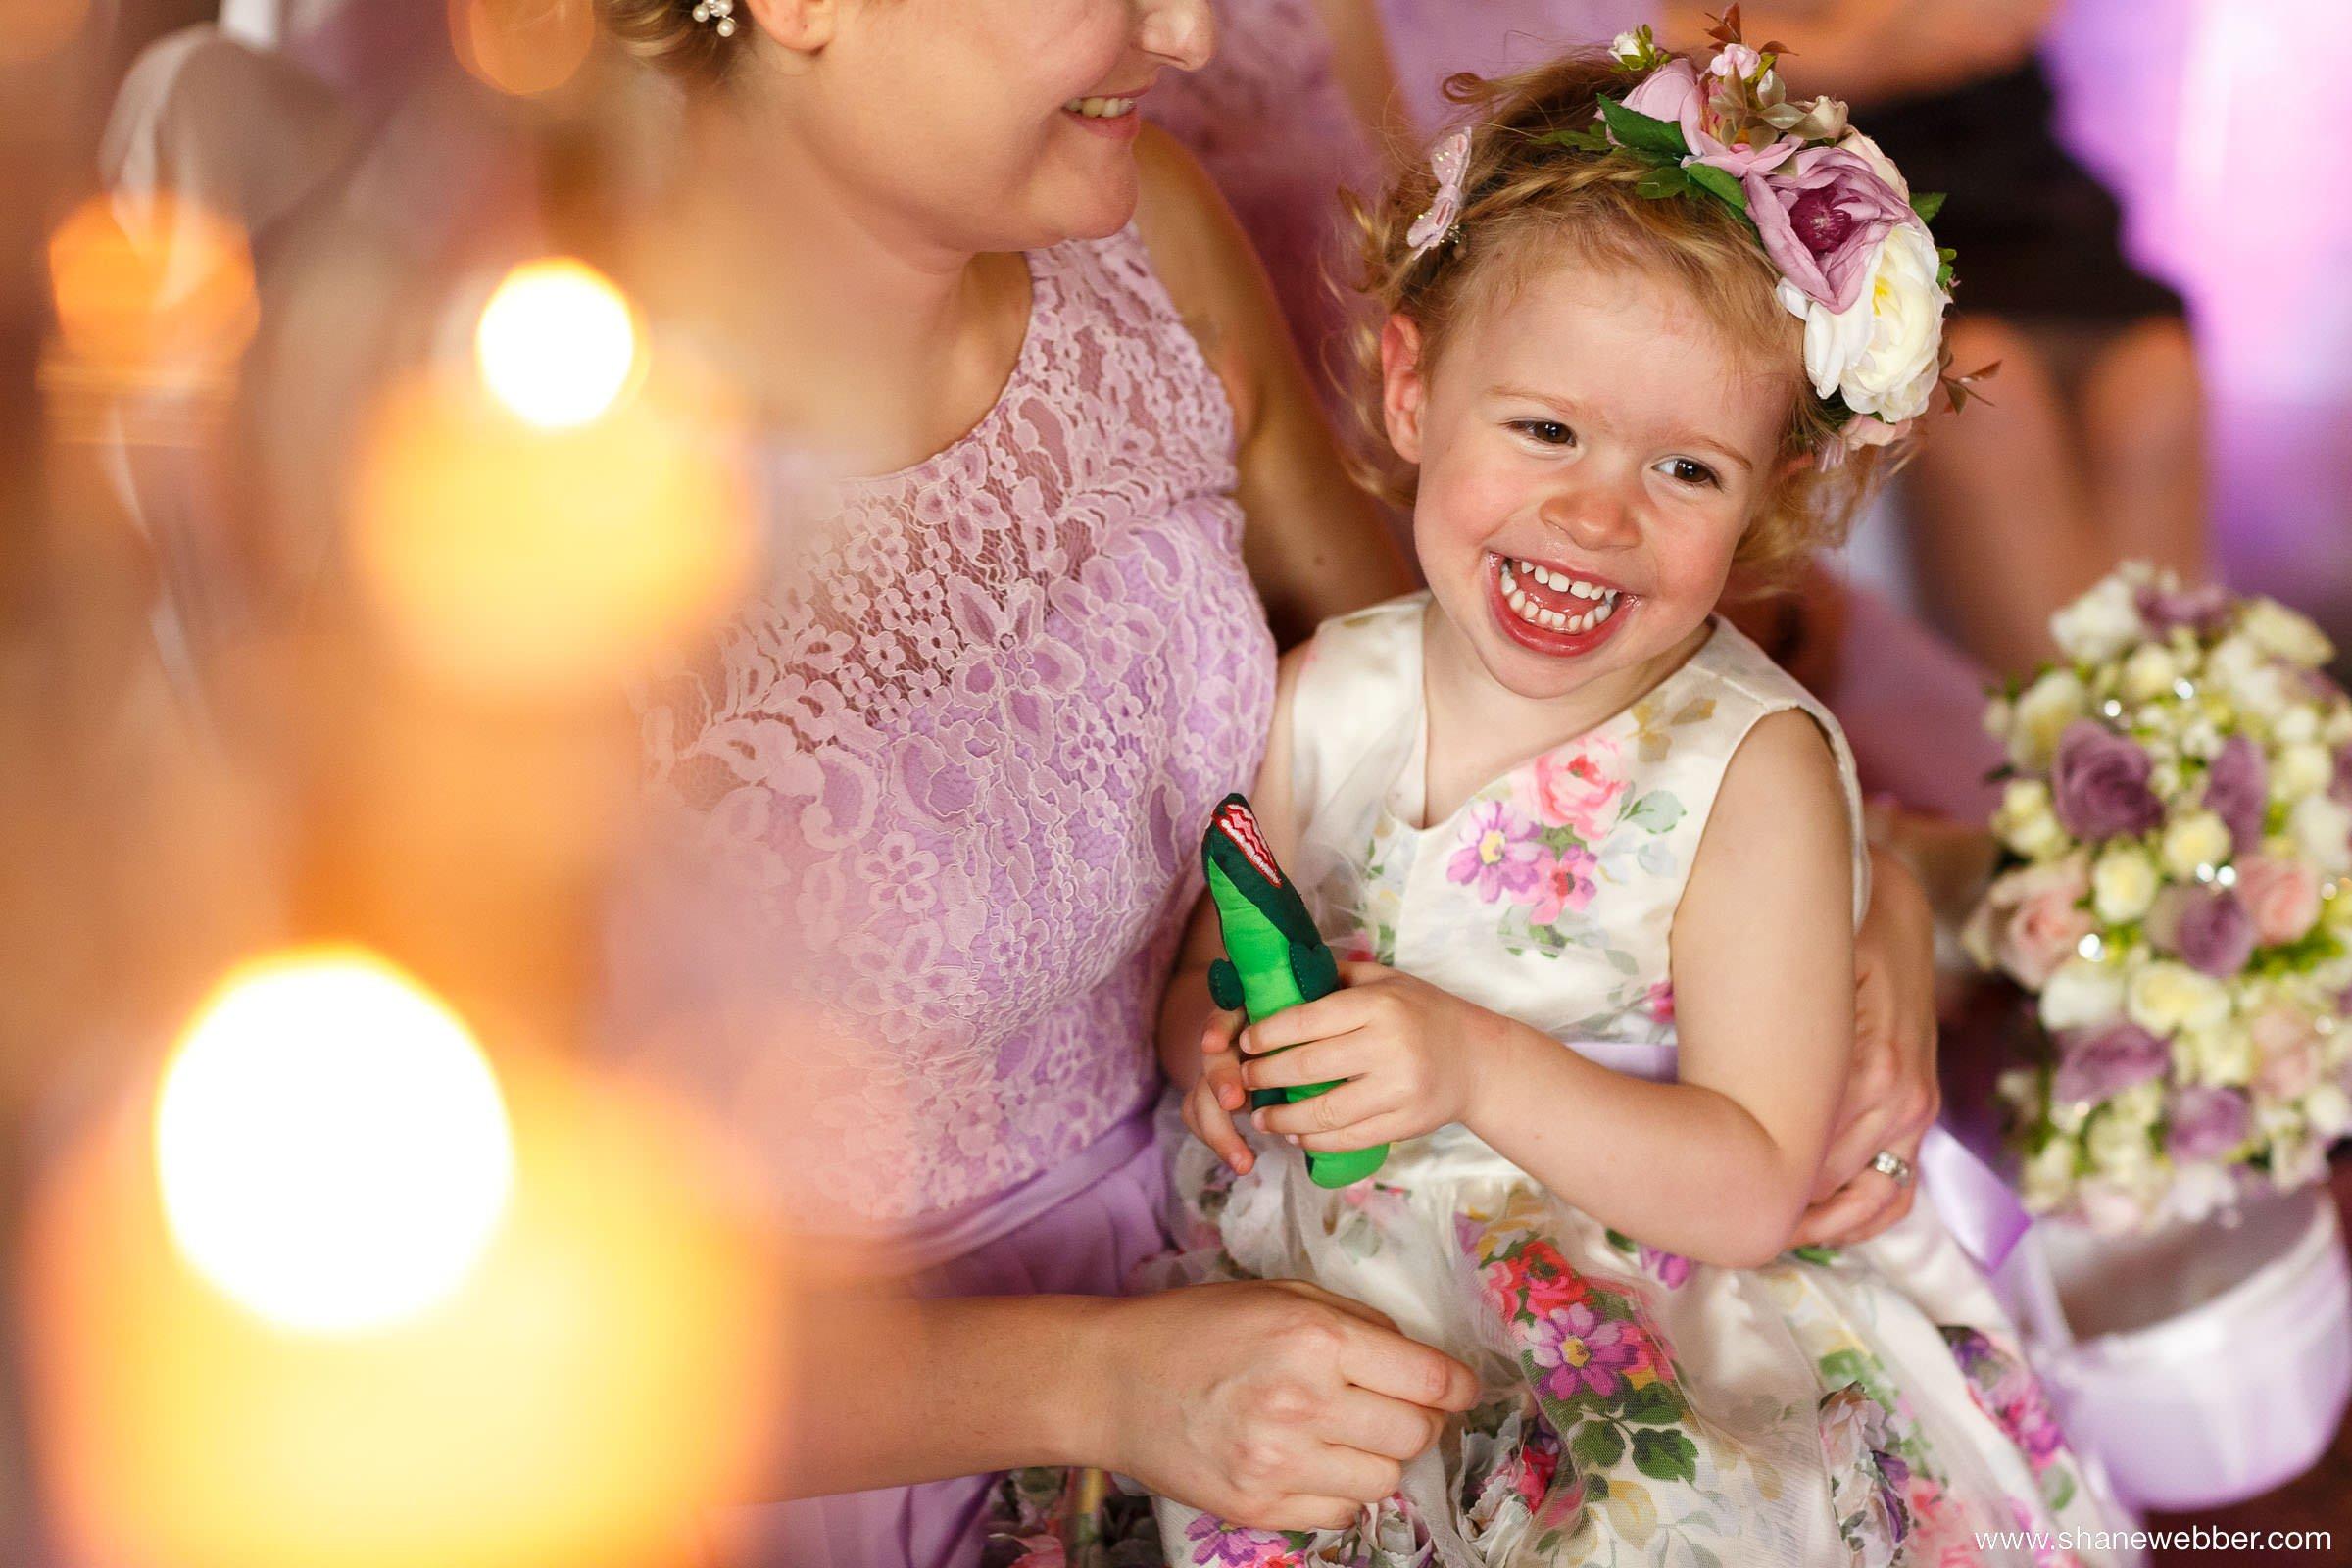 Laughing child at wedding